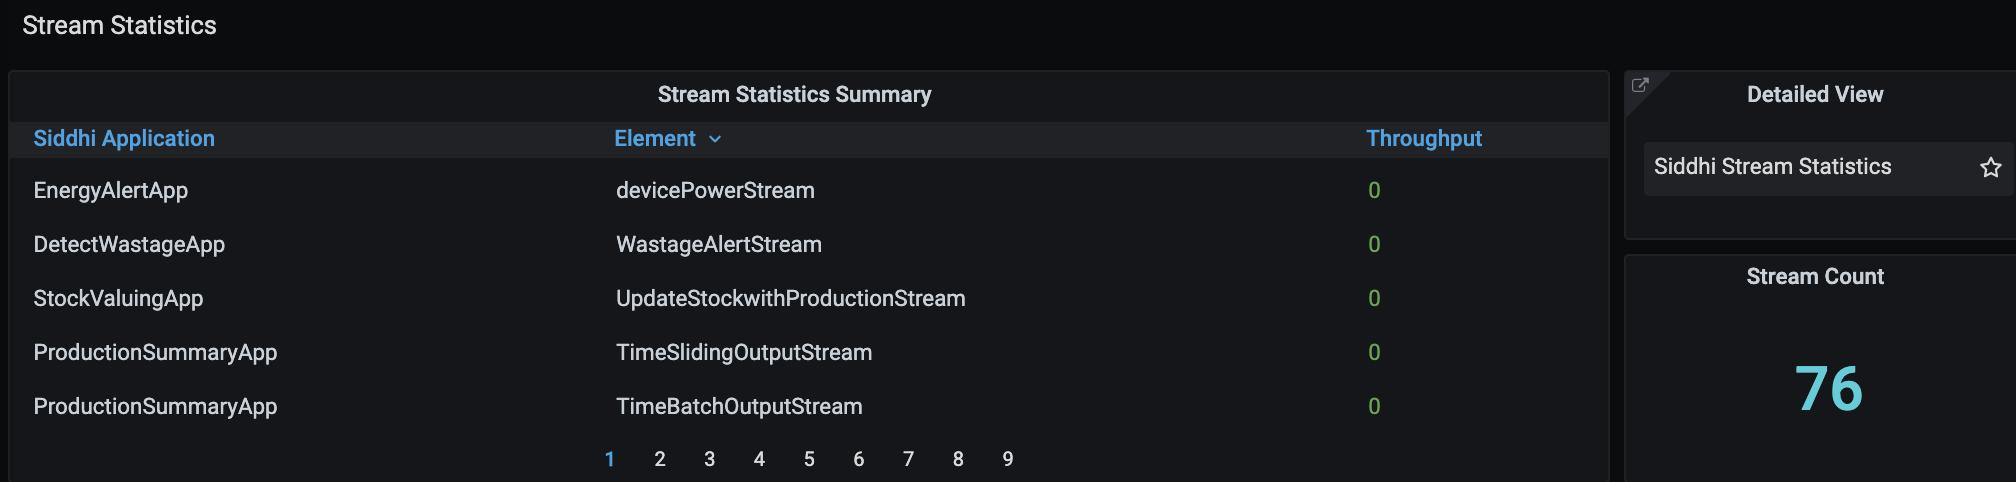 Stream Statistics